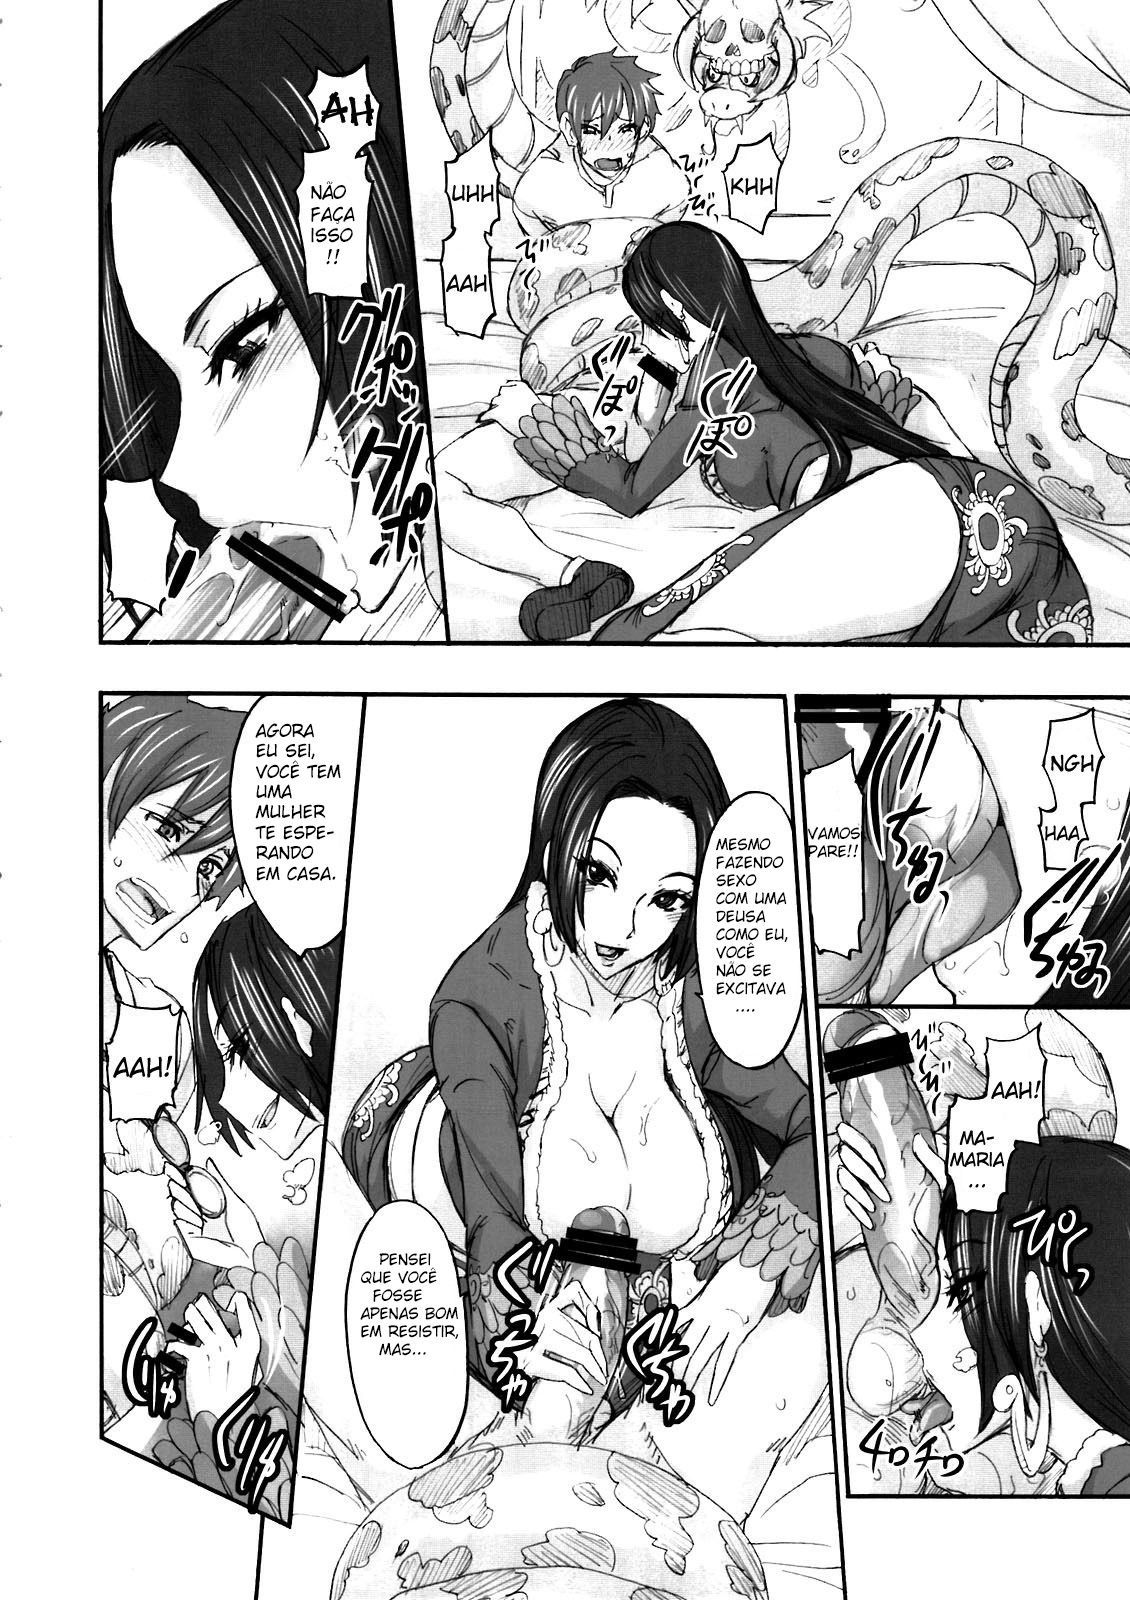 One Piece Hentai: A imperatriz puta